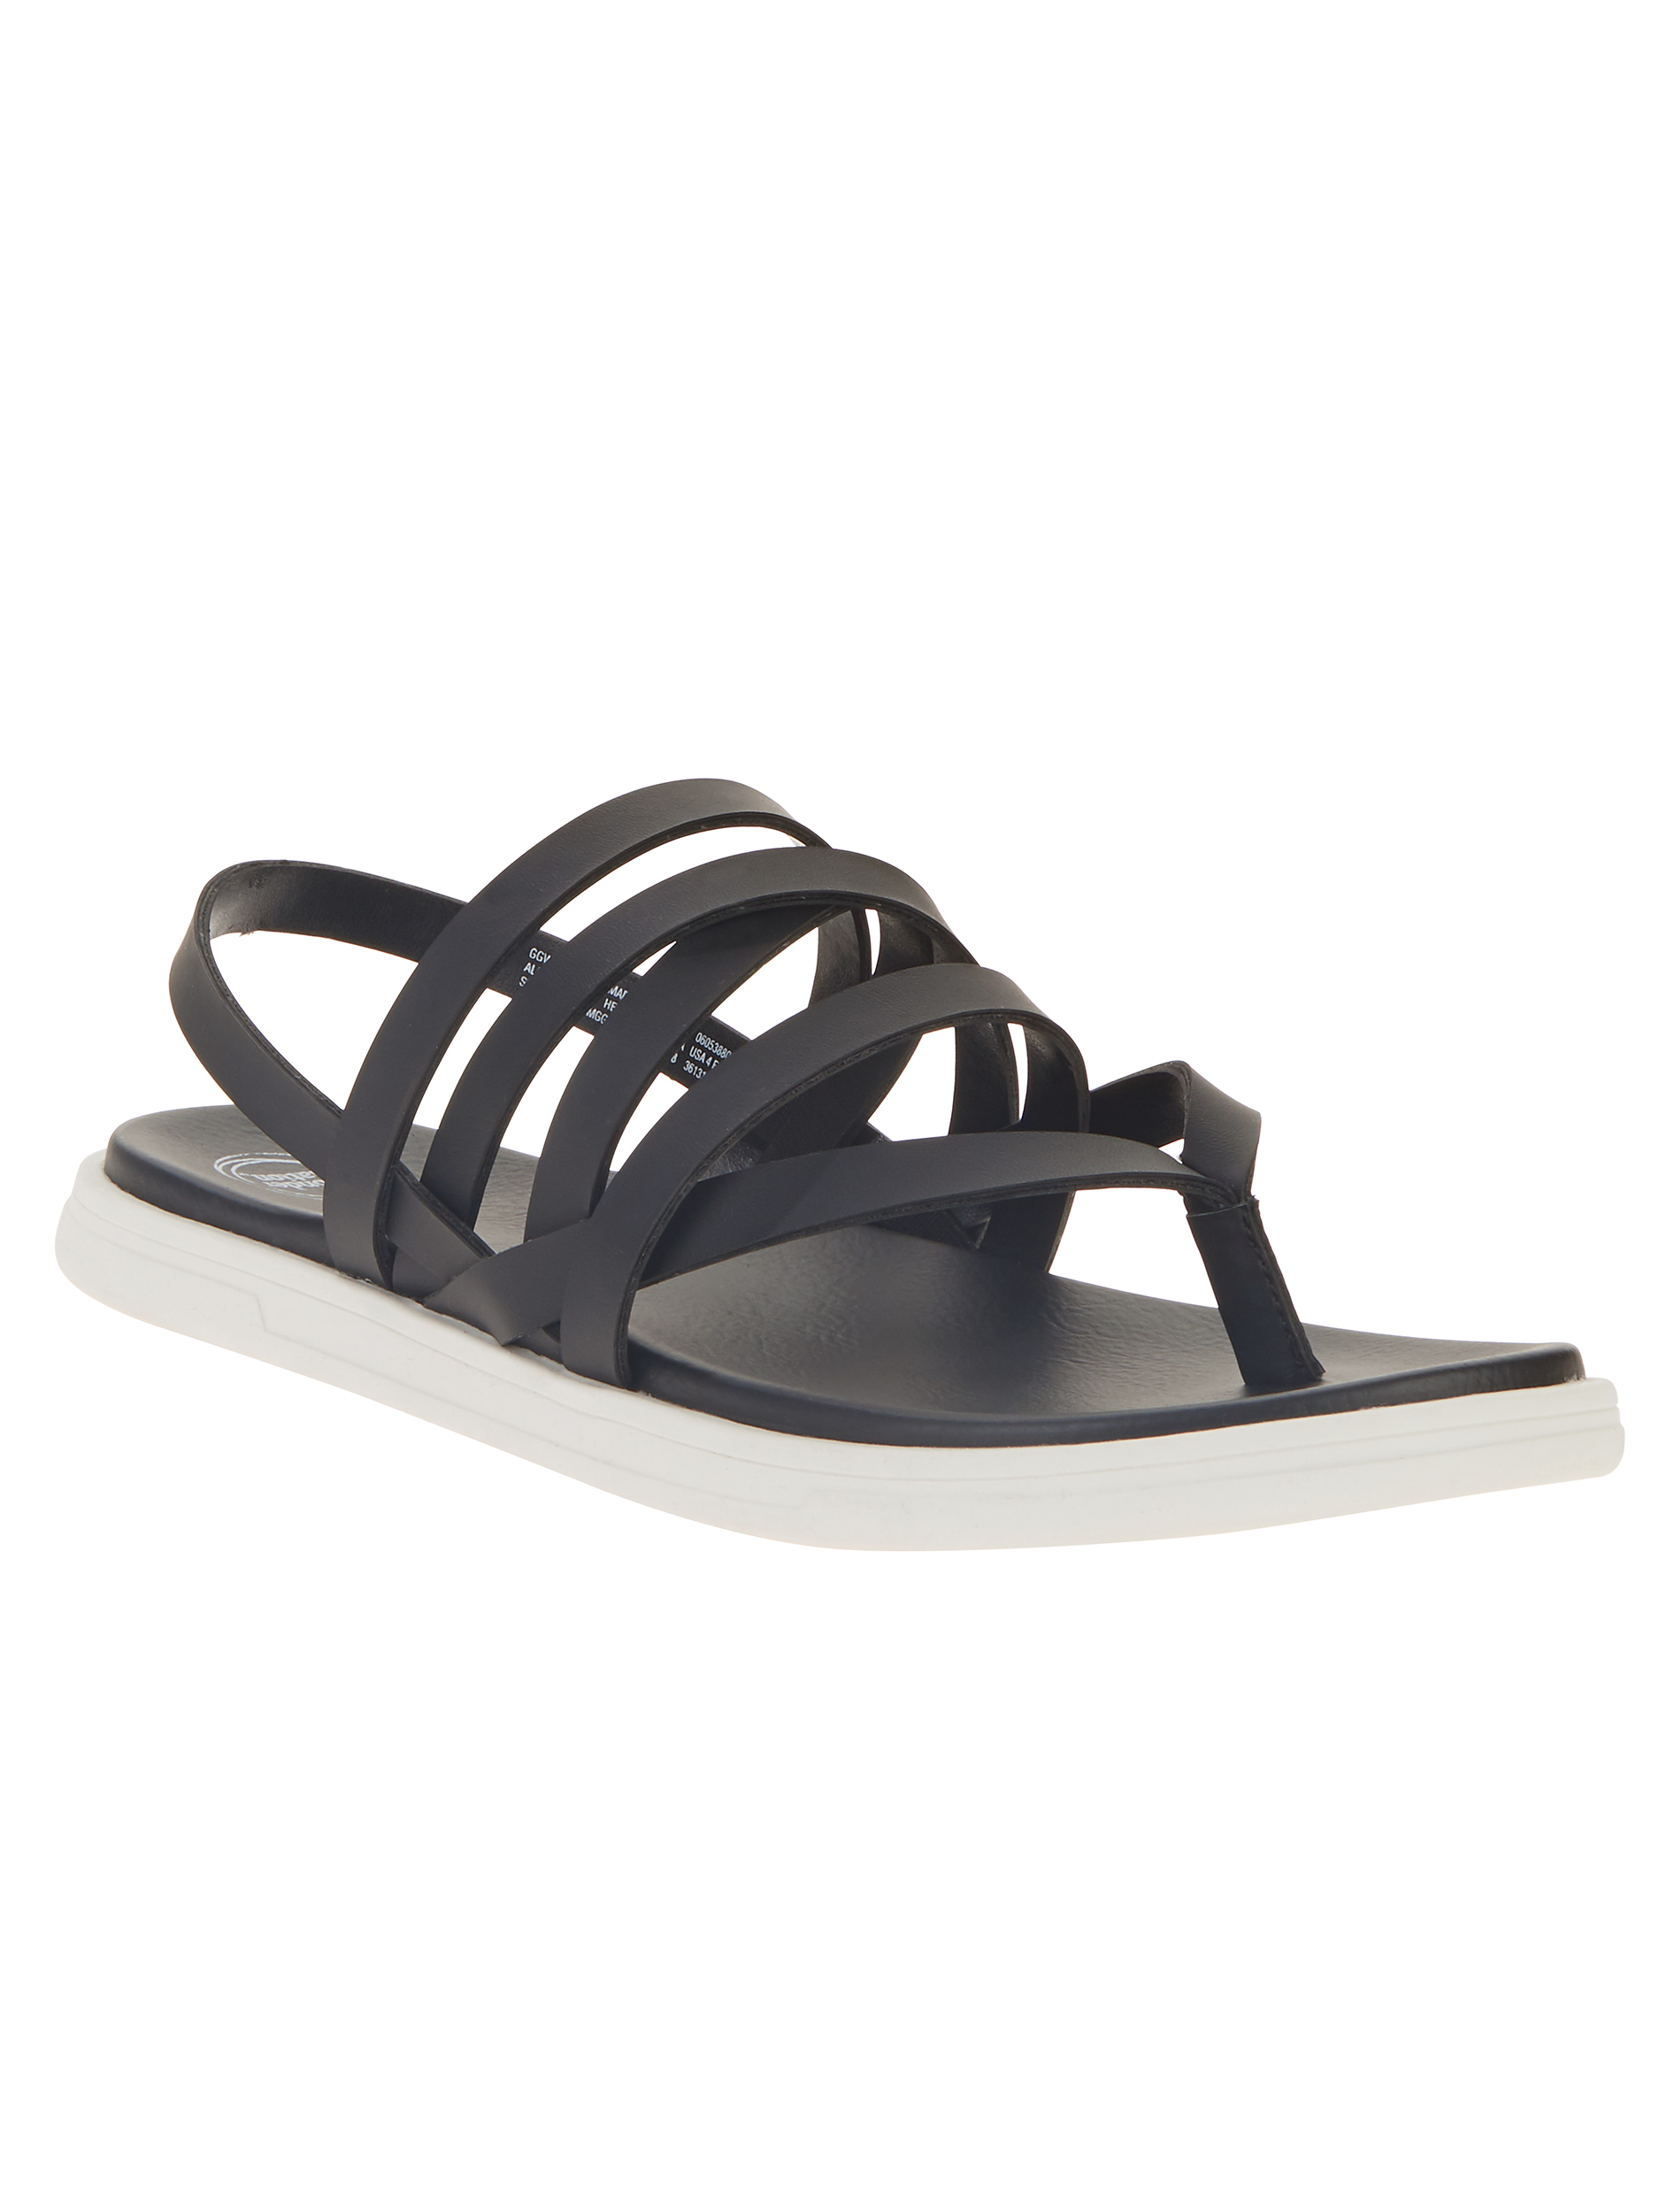 Girls' Strappy Sport Sandal